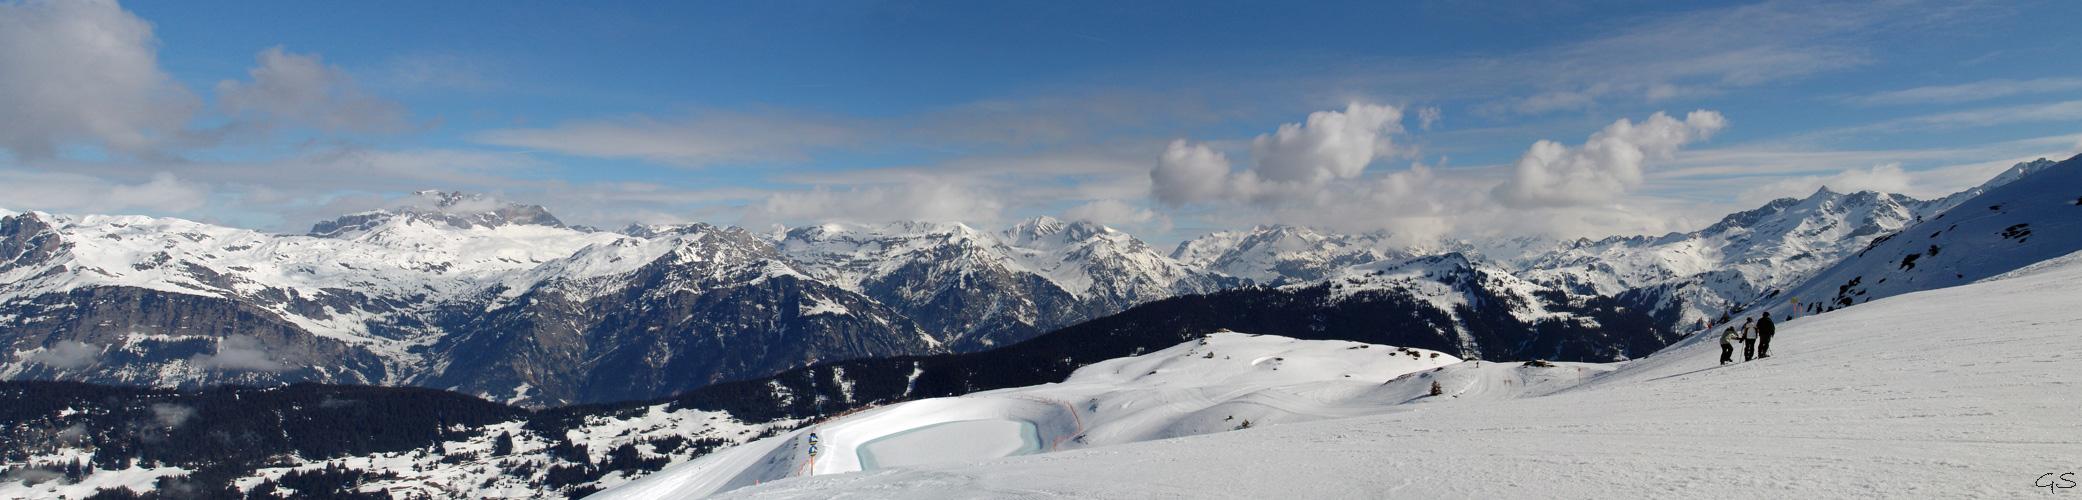 Sebliga Bergstation 2011